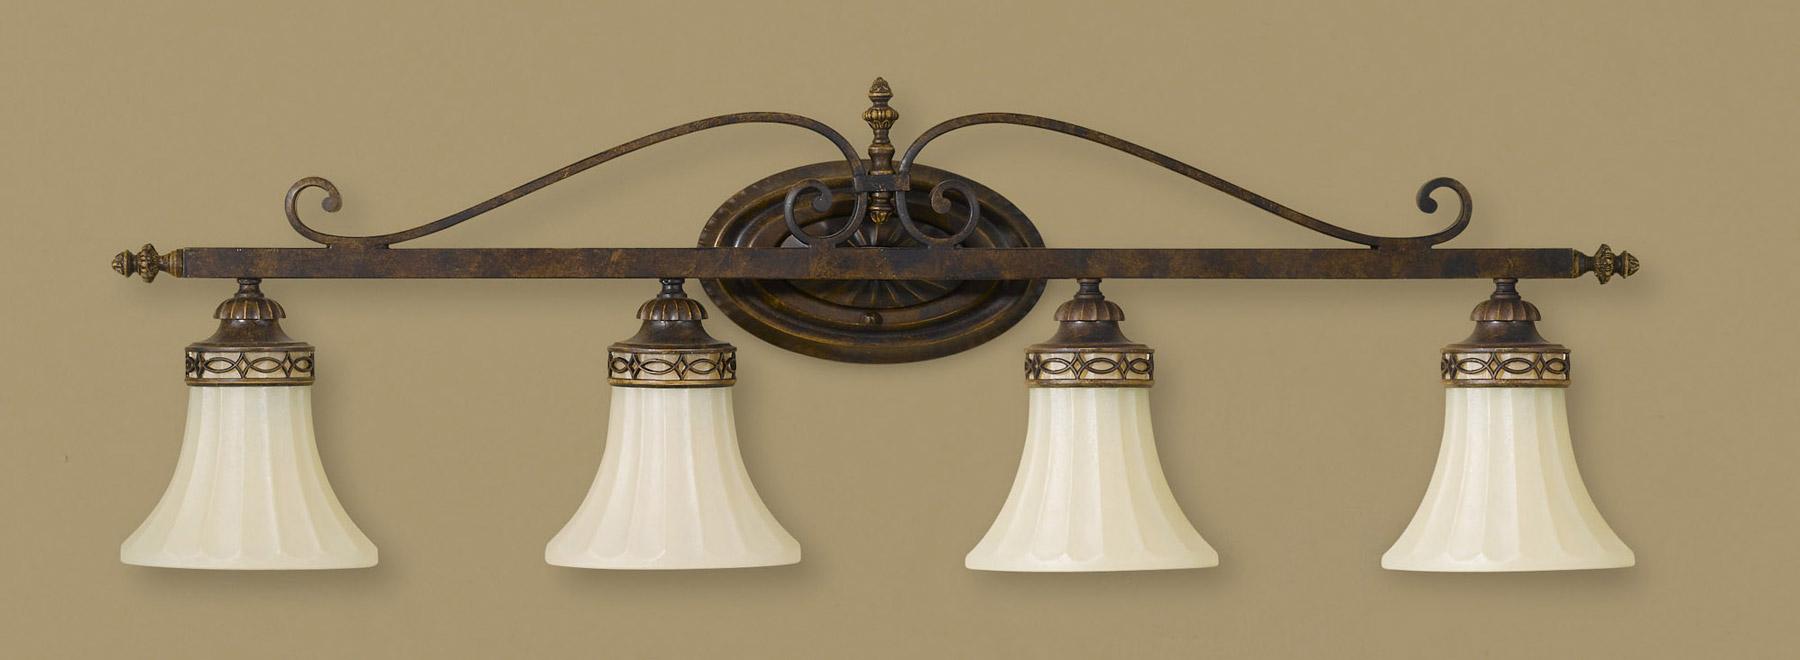 Murray feiss vs12504 wal drawing room vanity light for Murray feiss bathroom lighting fixtures